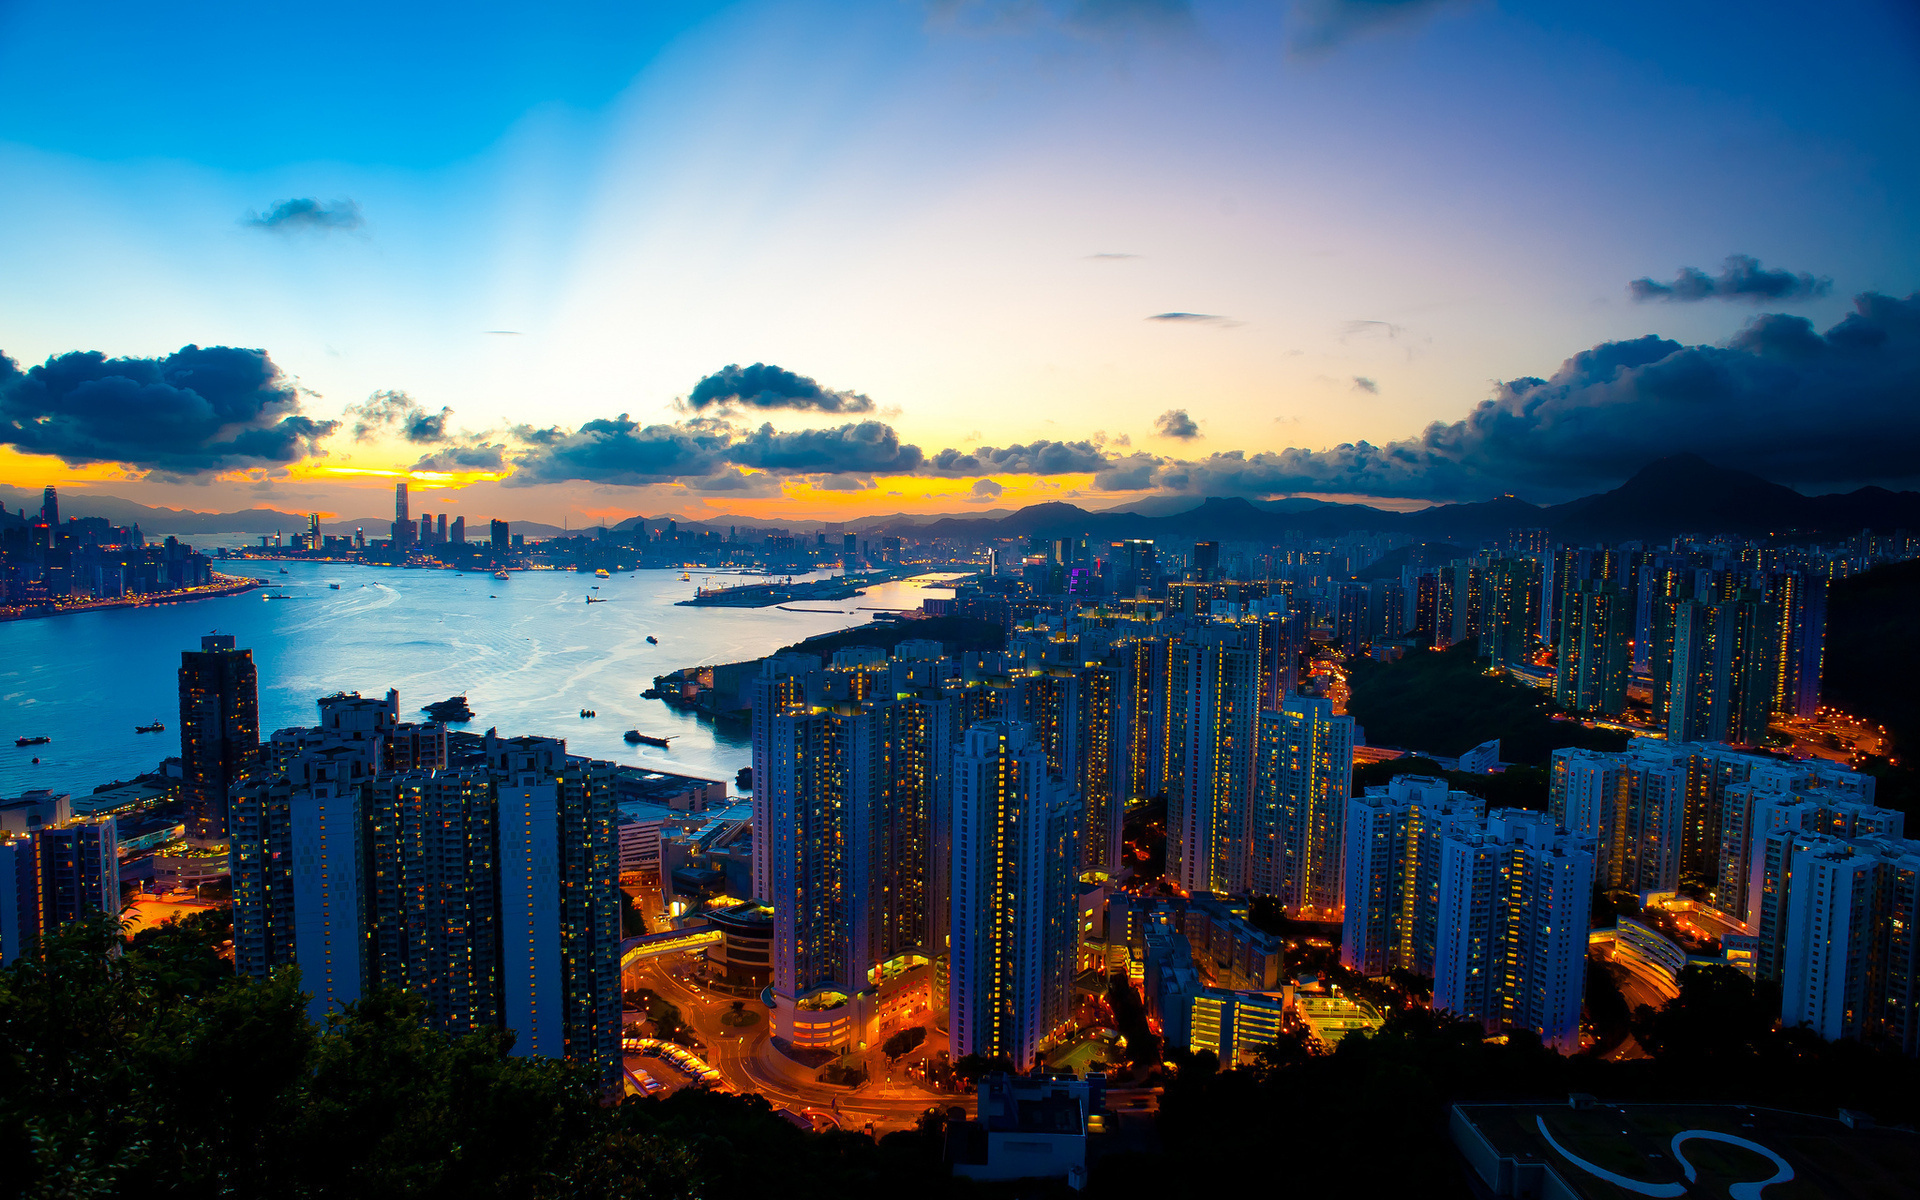 город, вечер, горы, небо, закат, залив, океан, красиво, вечер, гонконг, hong kong